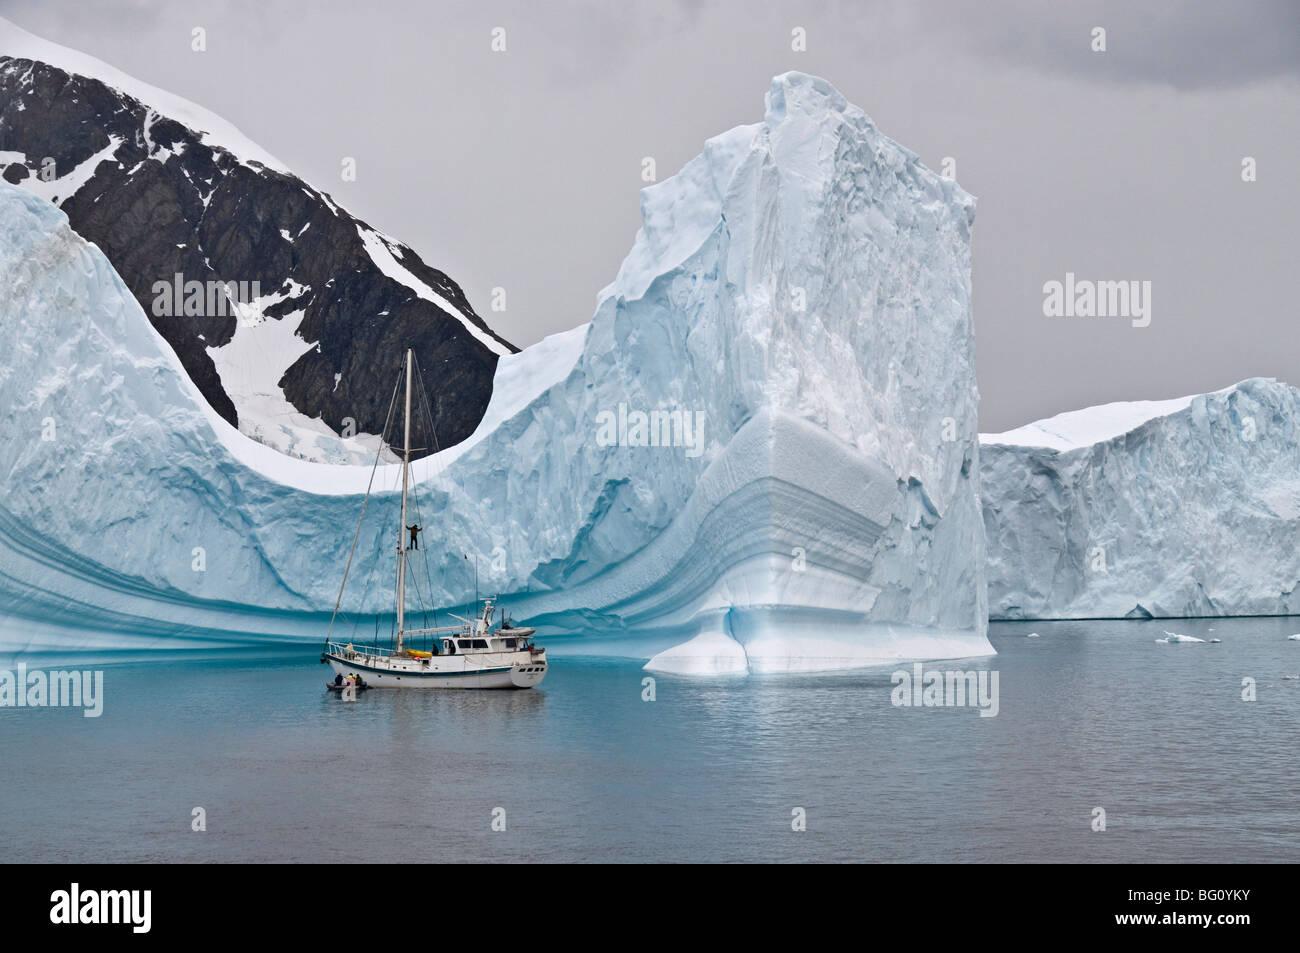 Sailing yacht and iceberg, Errera Channel, Antarctic Peninsula, Antarctica, Polar Regions - Stock Image